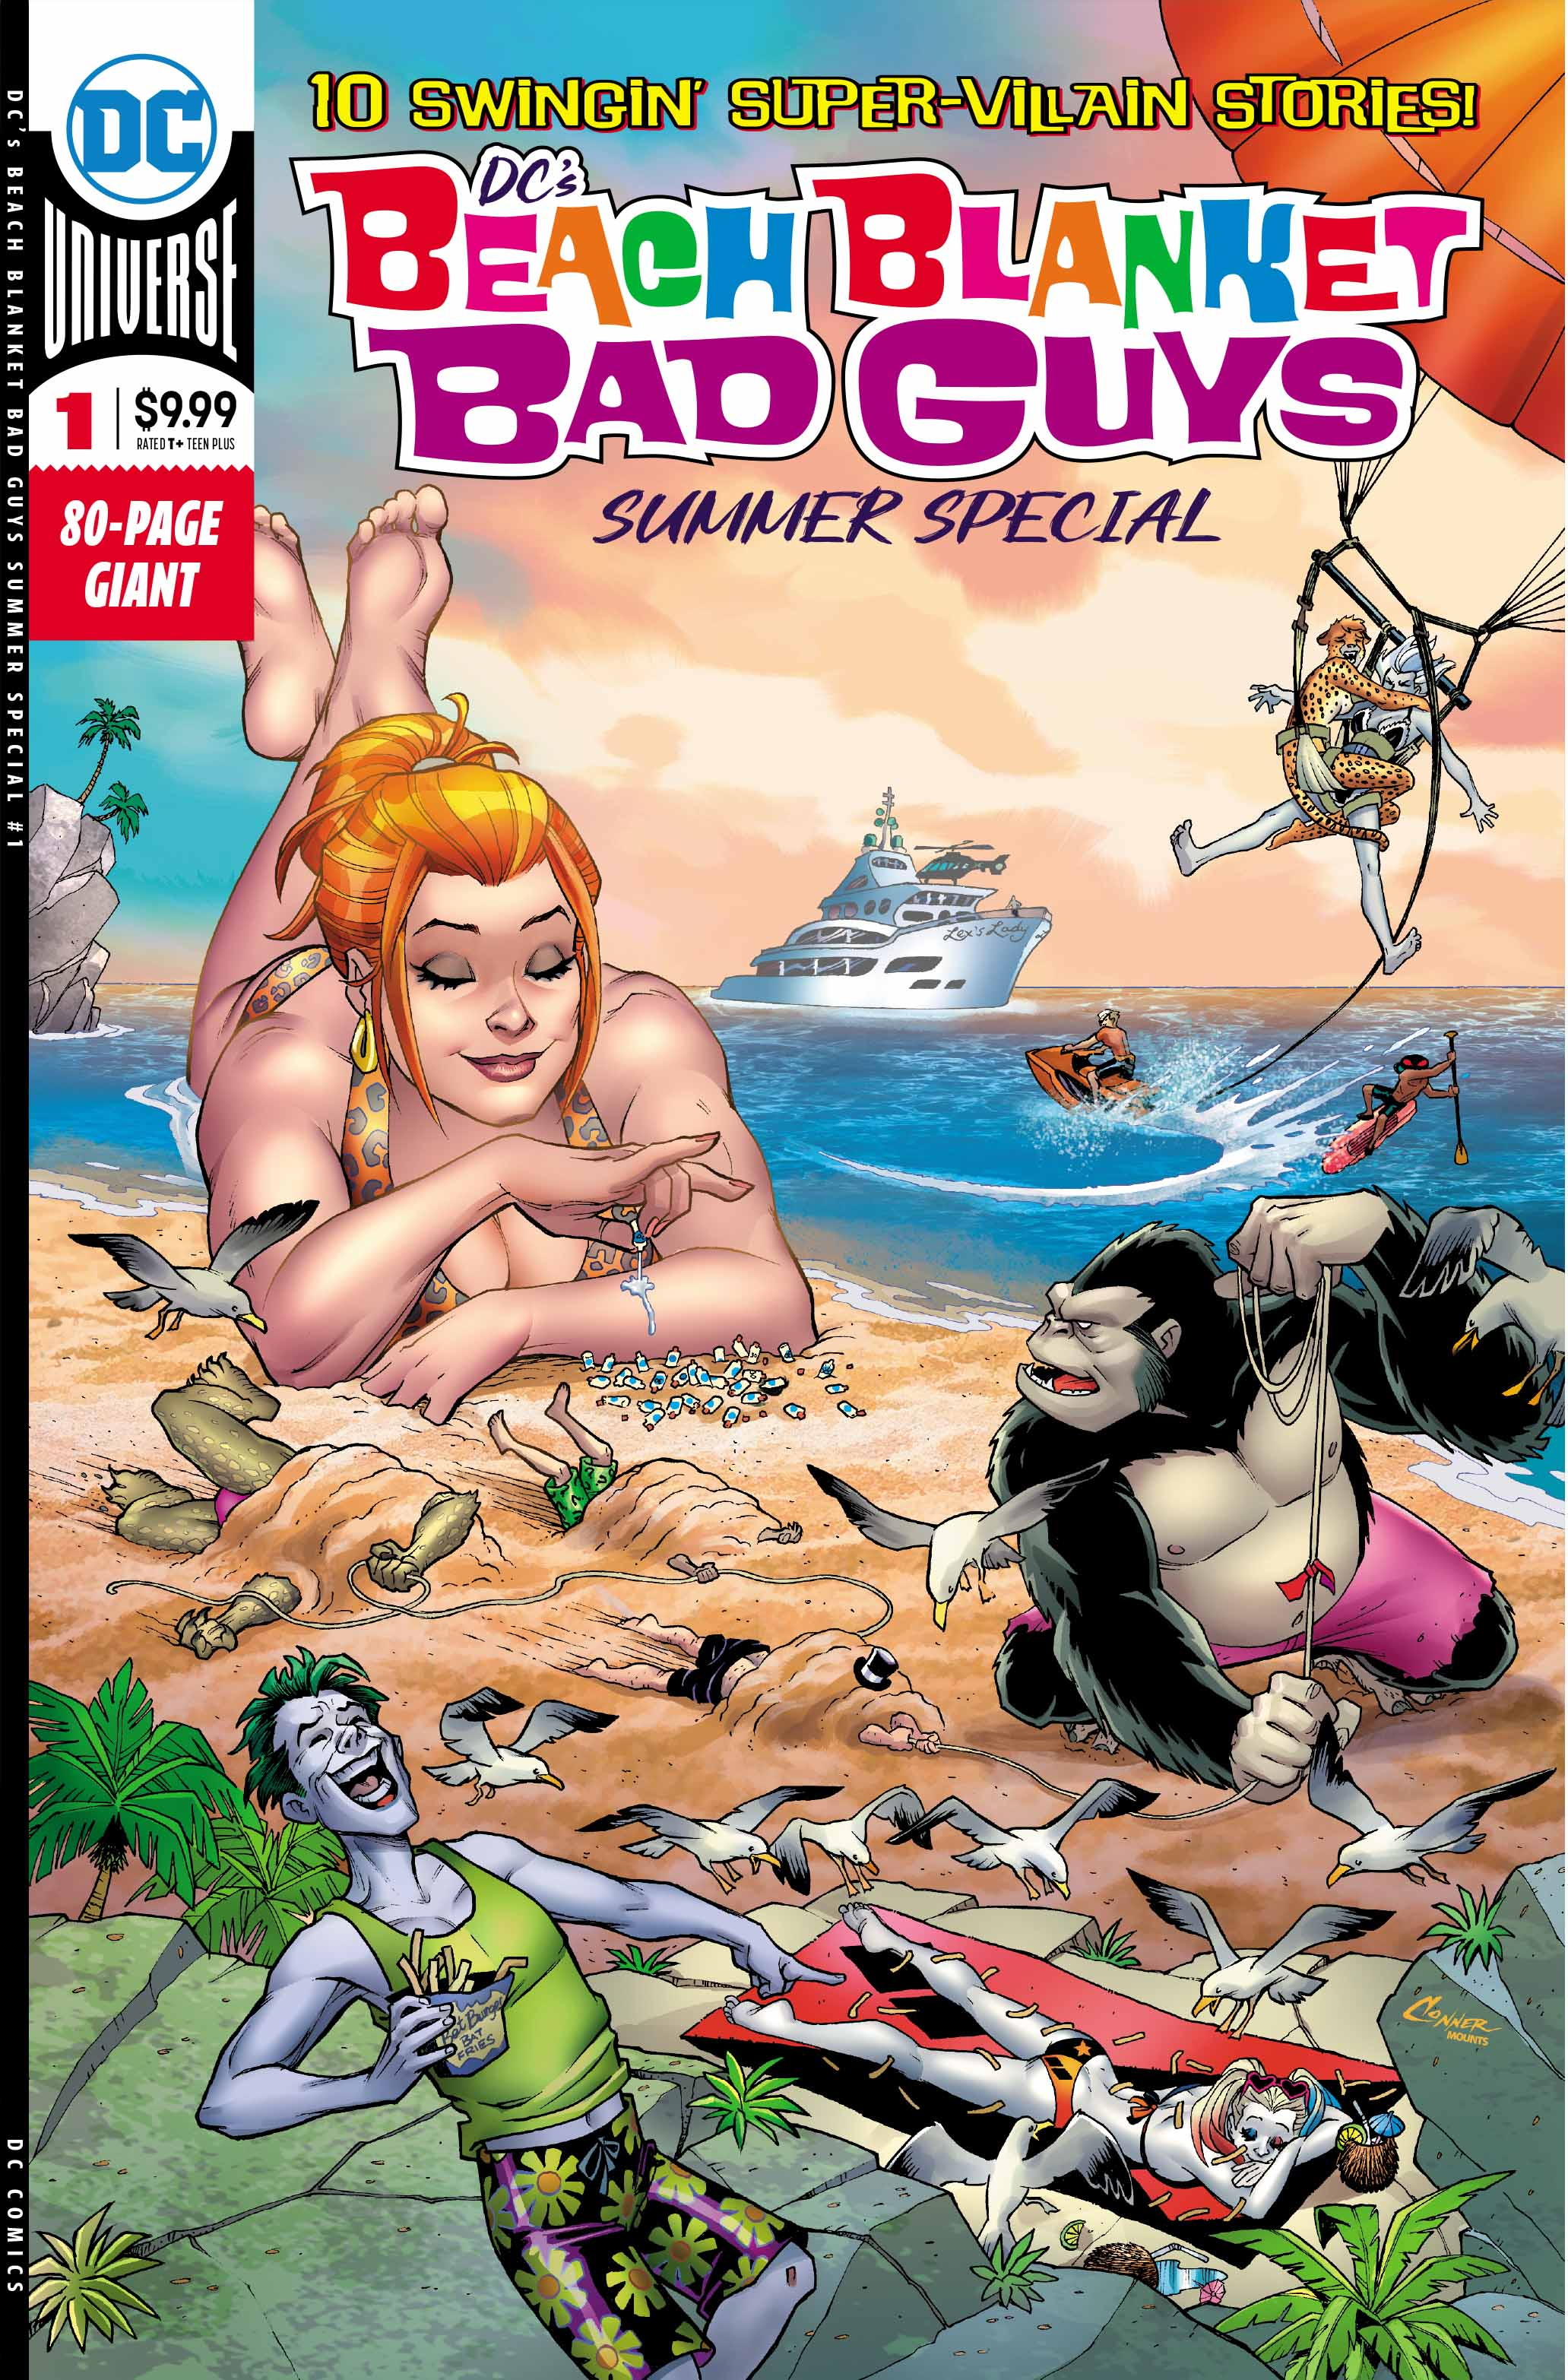 DC's Beach Blanket Bad Guys Summer Special #1